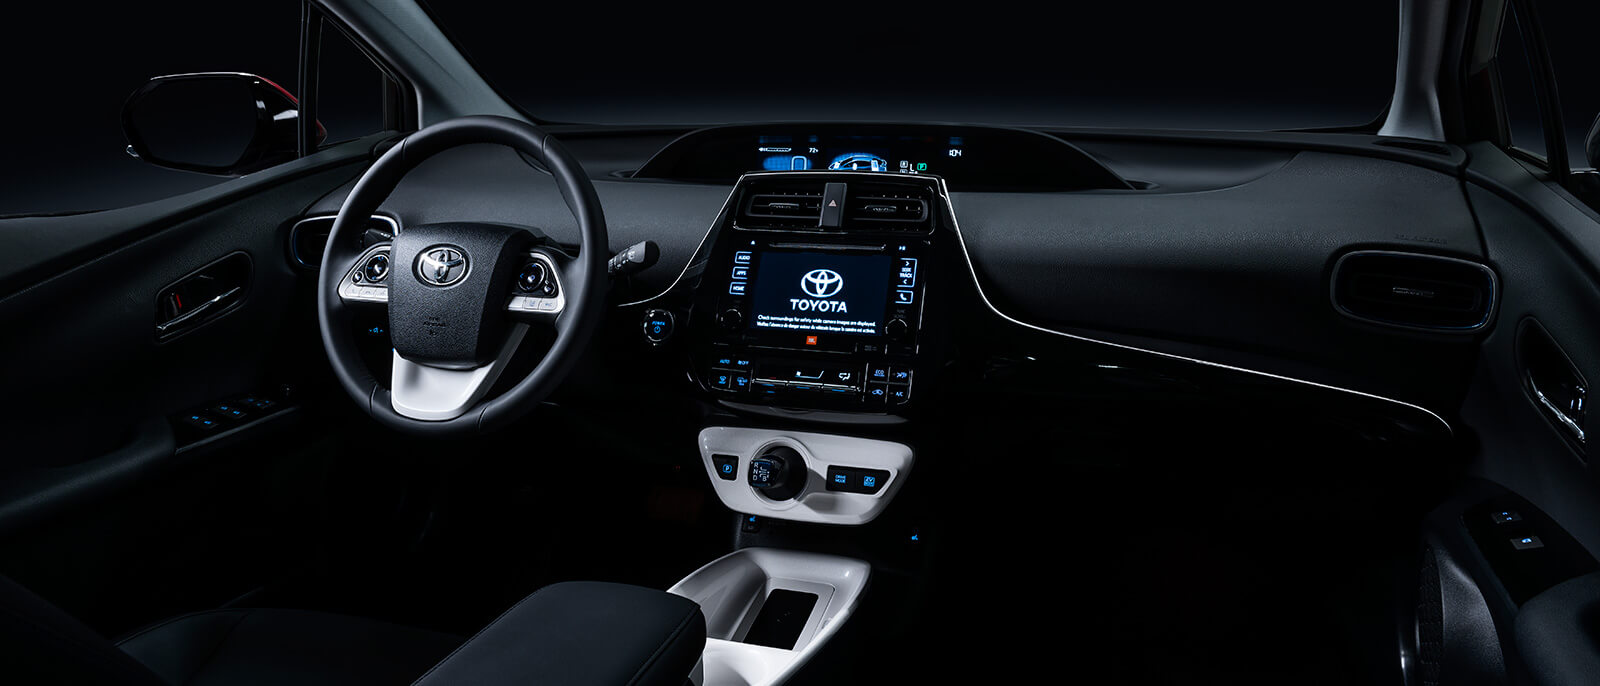 Dark Toyota Steering Wheel and Dashboard